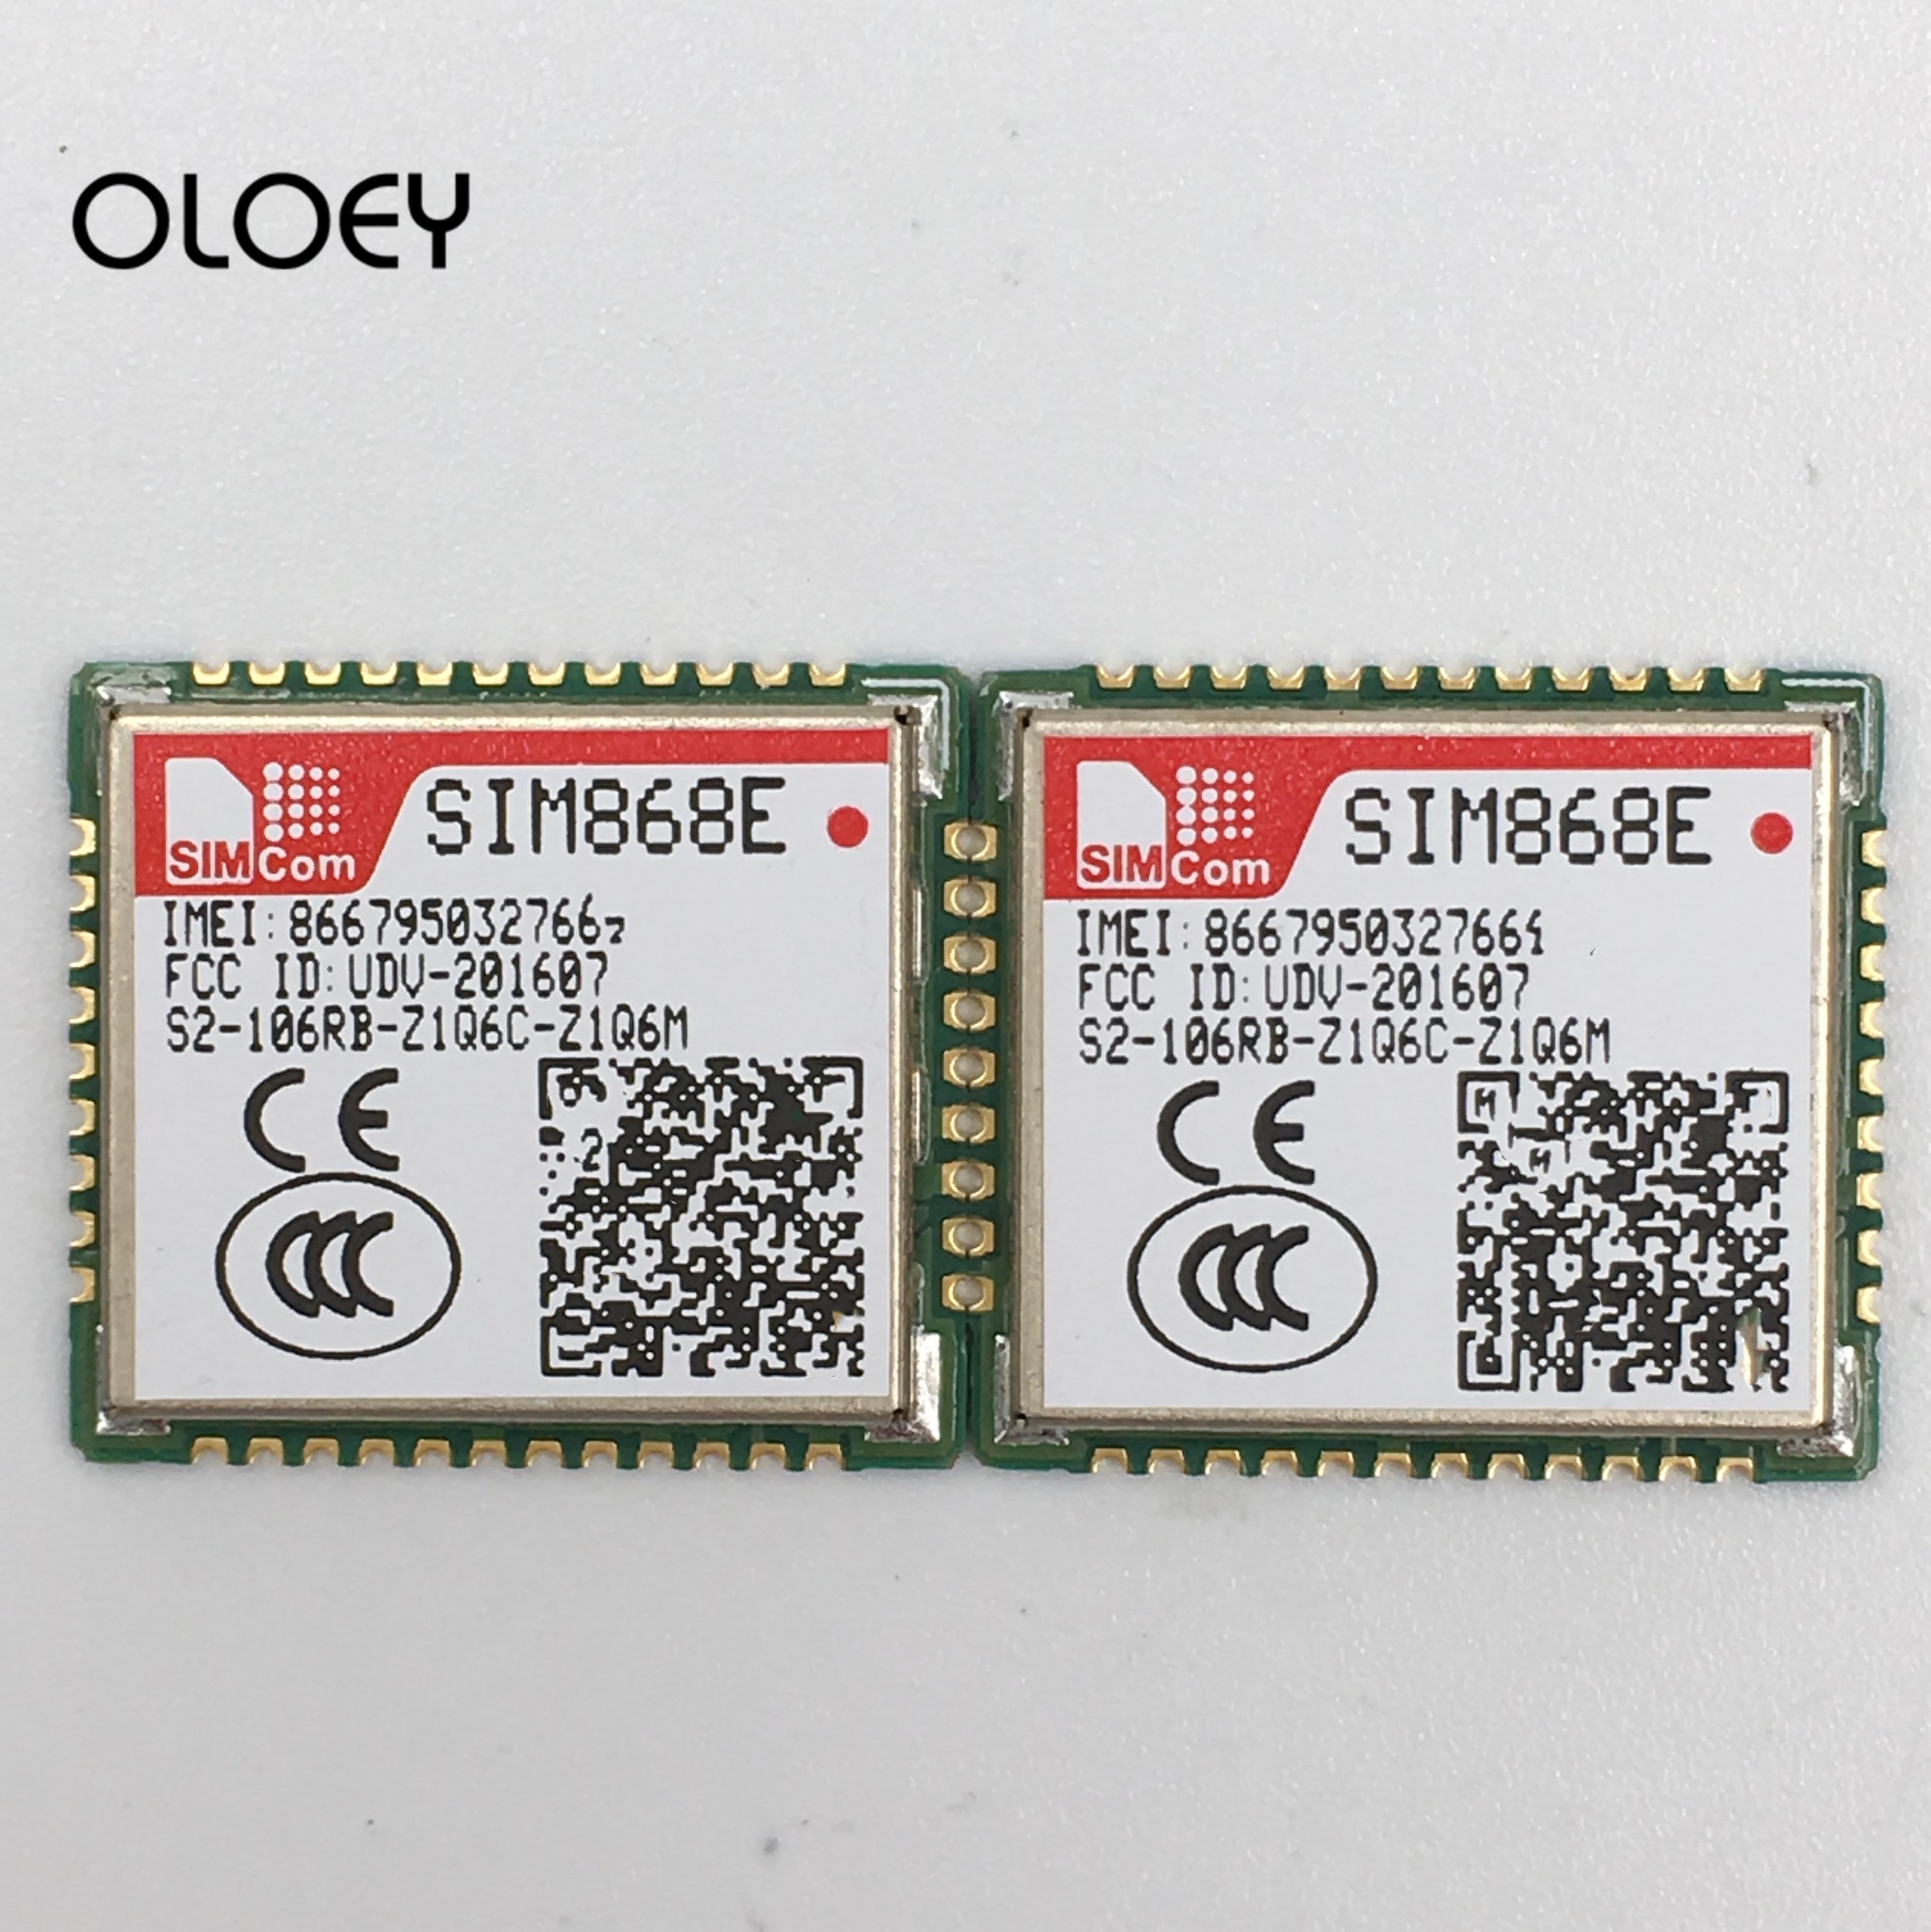 SIM868E GPRS GNSS Bluetooth Module Low Power Consumption, BT4.0 ,Guaranteed 100% New Original Stock SIM868